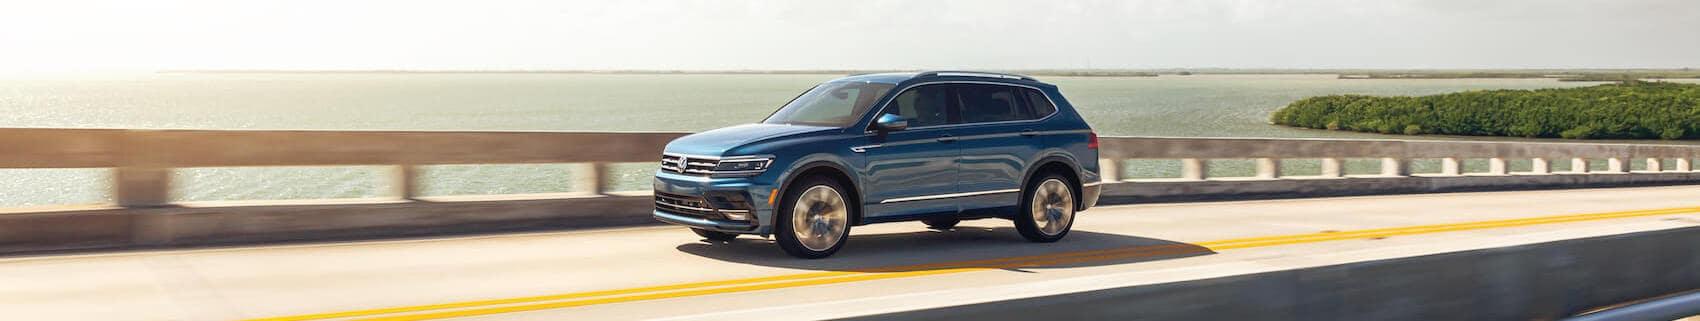 2020 Volkswagen Tiguan for sale Toms River, NJ